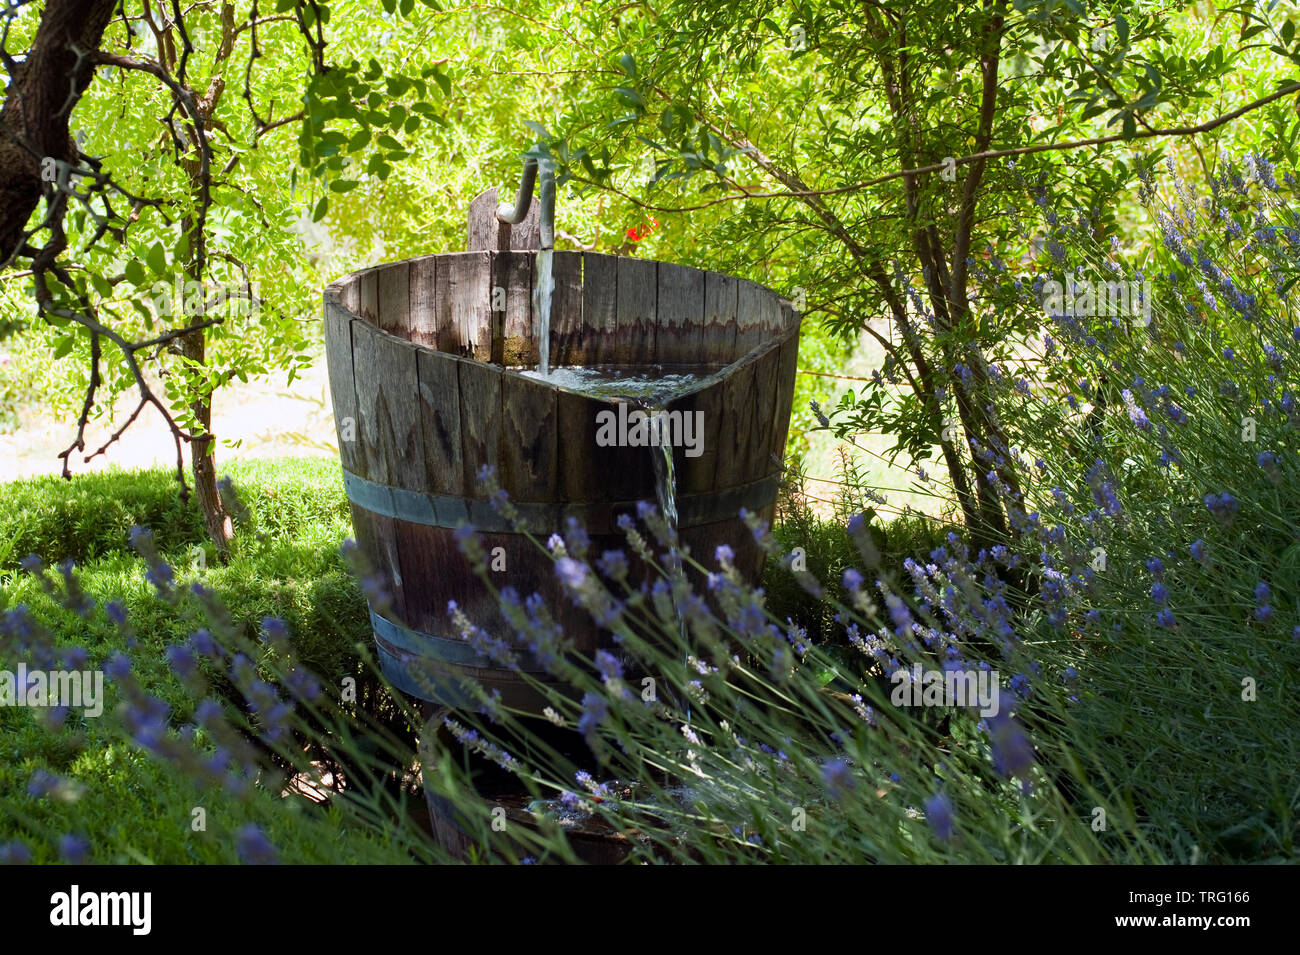 Garten im Libanon - Stock Image